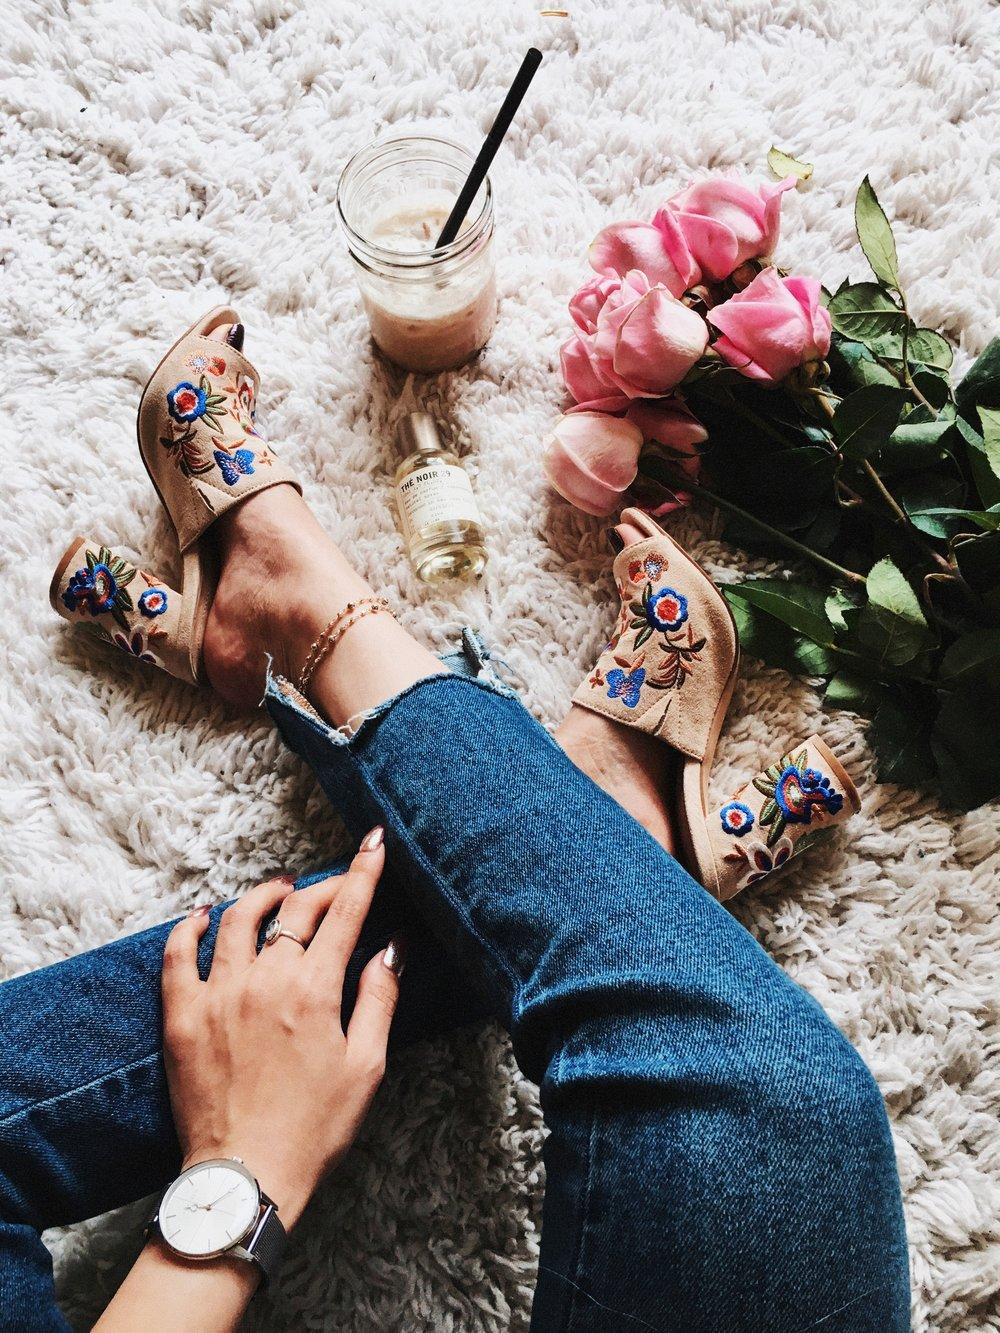 Aldo Yaessi Floral-Embroidered Mules-Pink Roses-Zara Floral bag - Le Labo Eau de Parfum - Aika's Love Closet - Seattle Fashion Style Blogger - Japanese 2